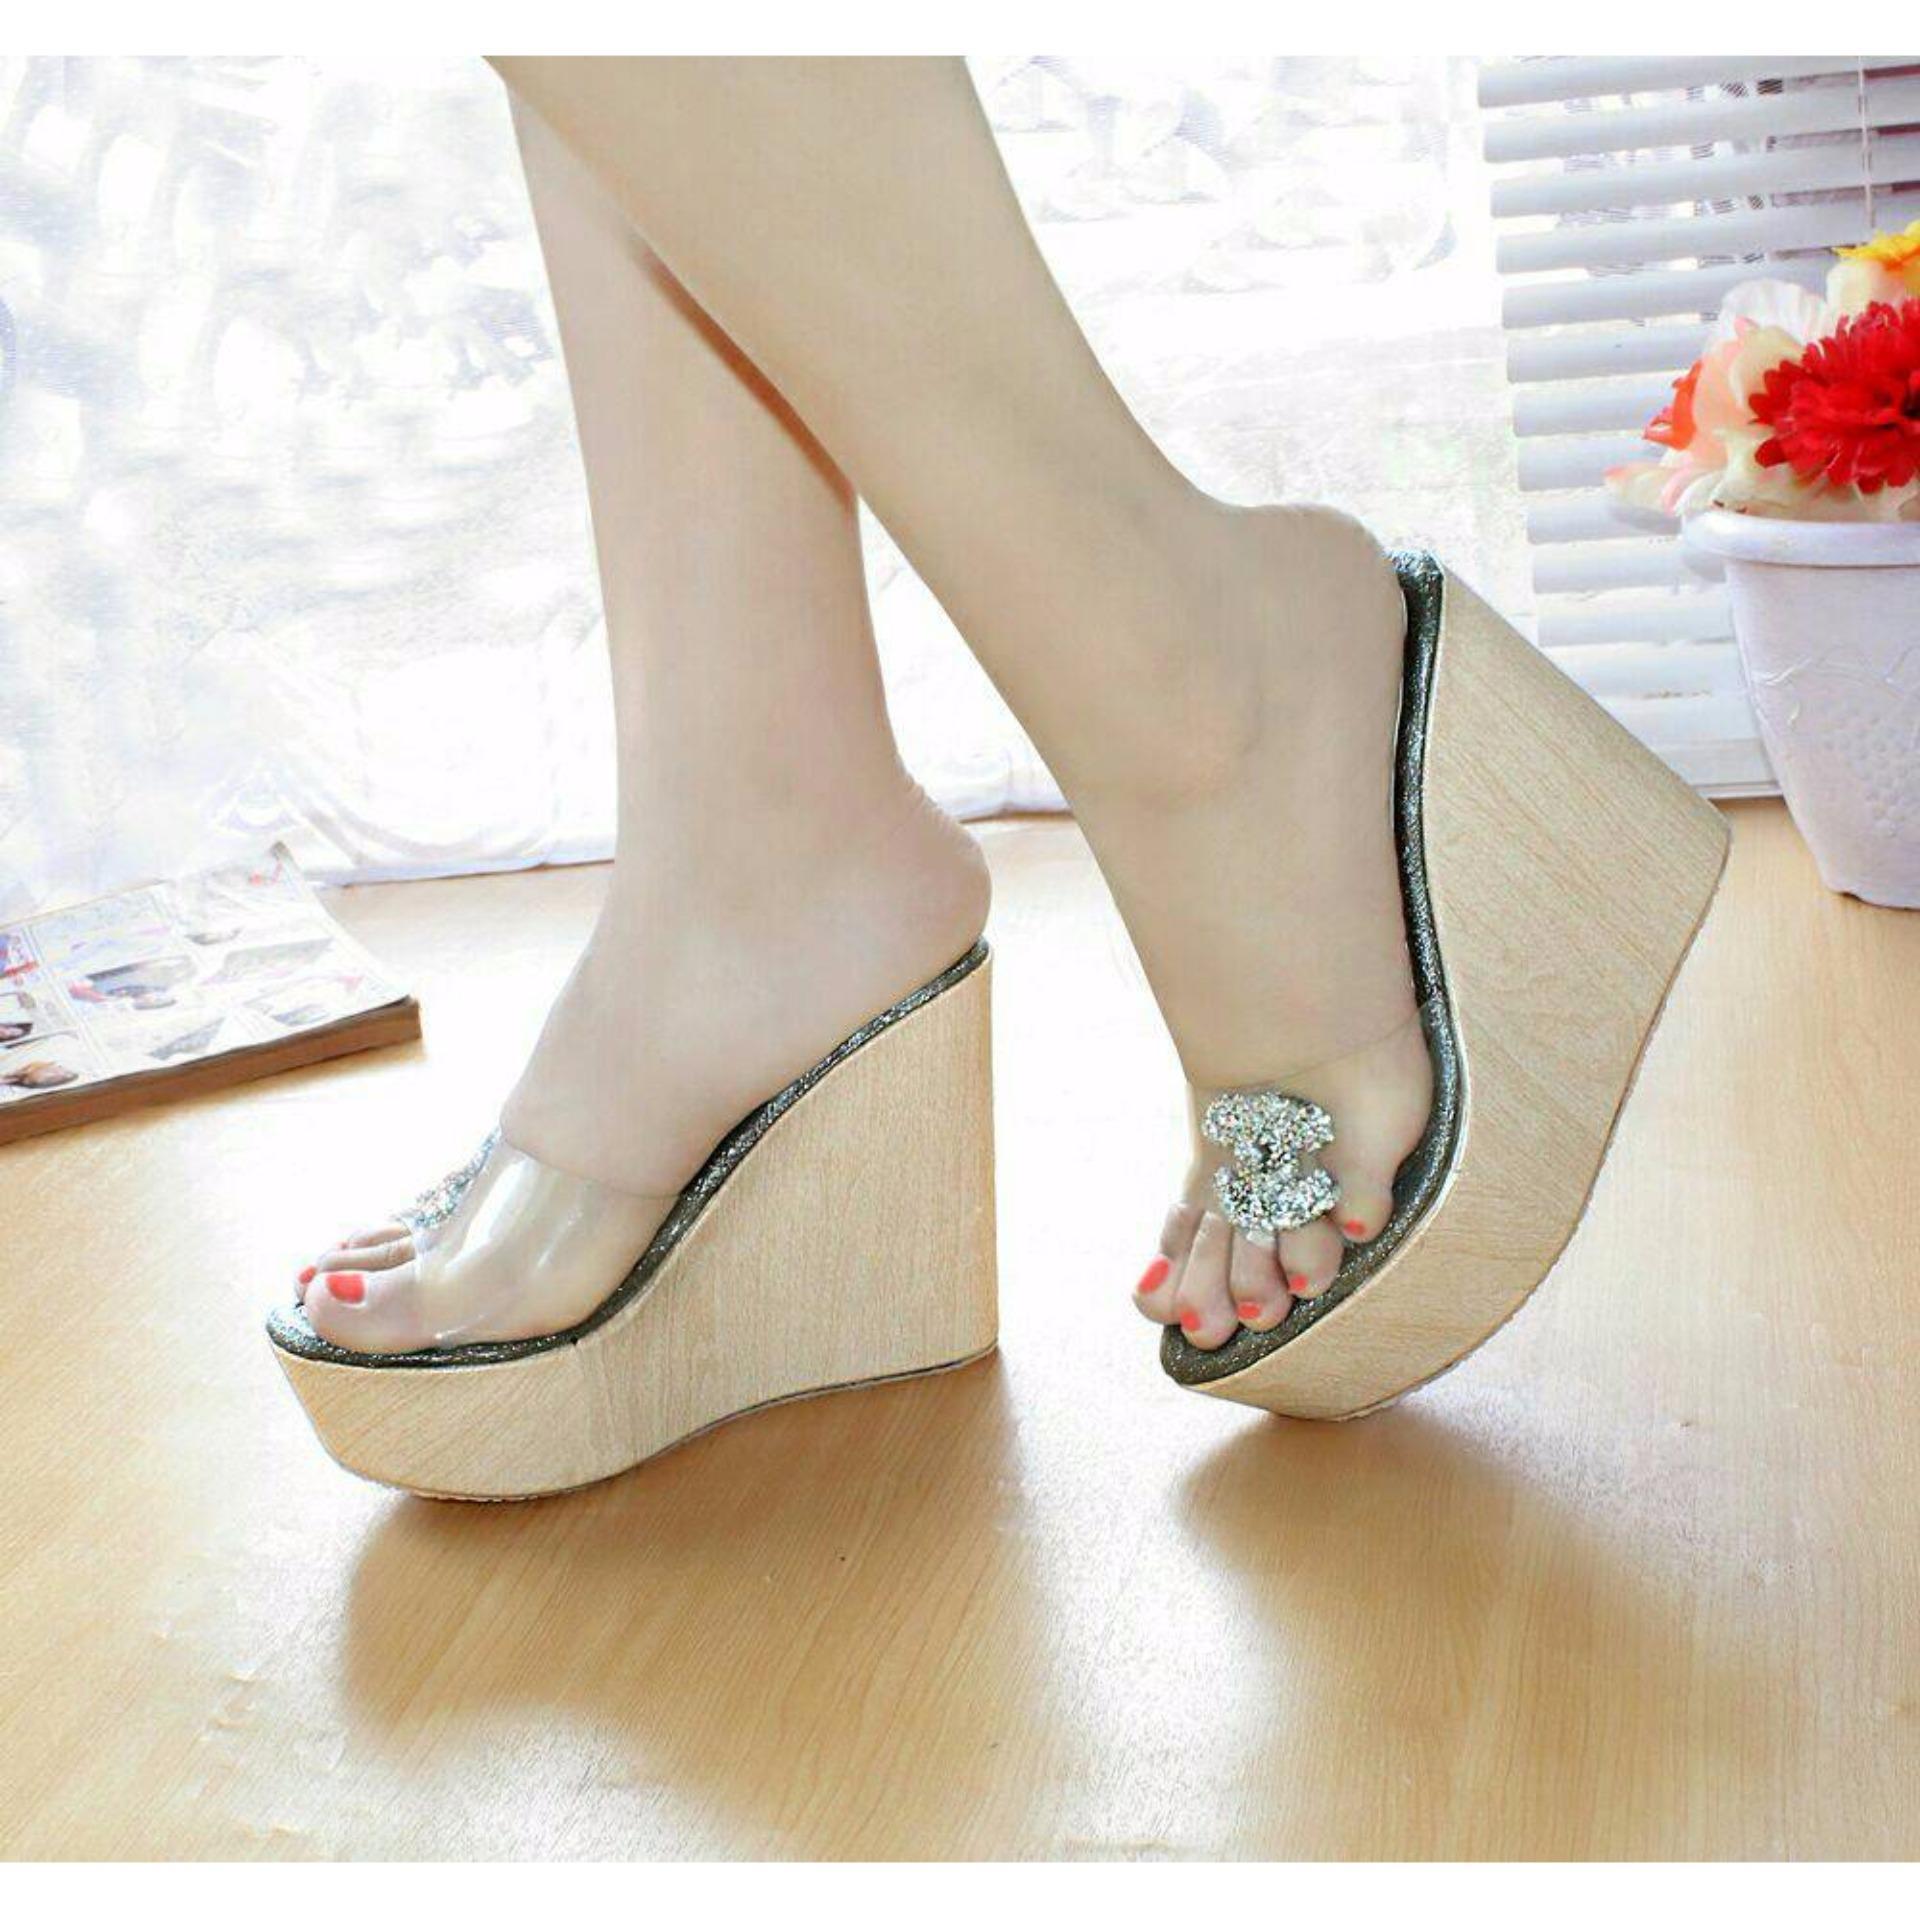 Sepatu Wanita Wedges Selop Channel Mika Hitam bf68a07ca5